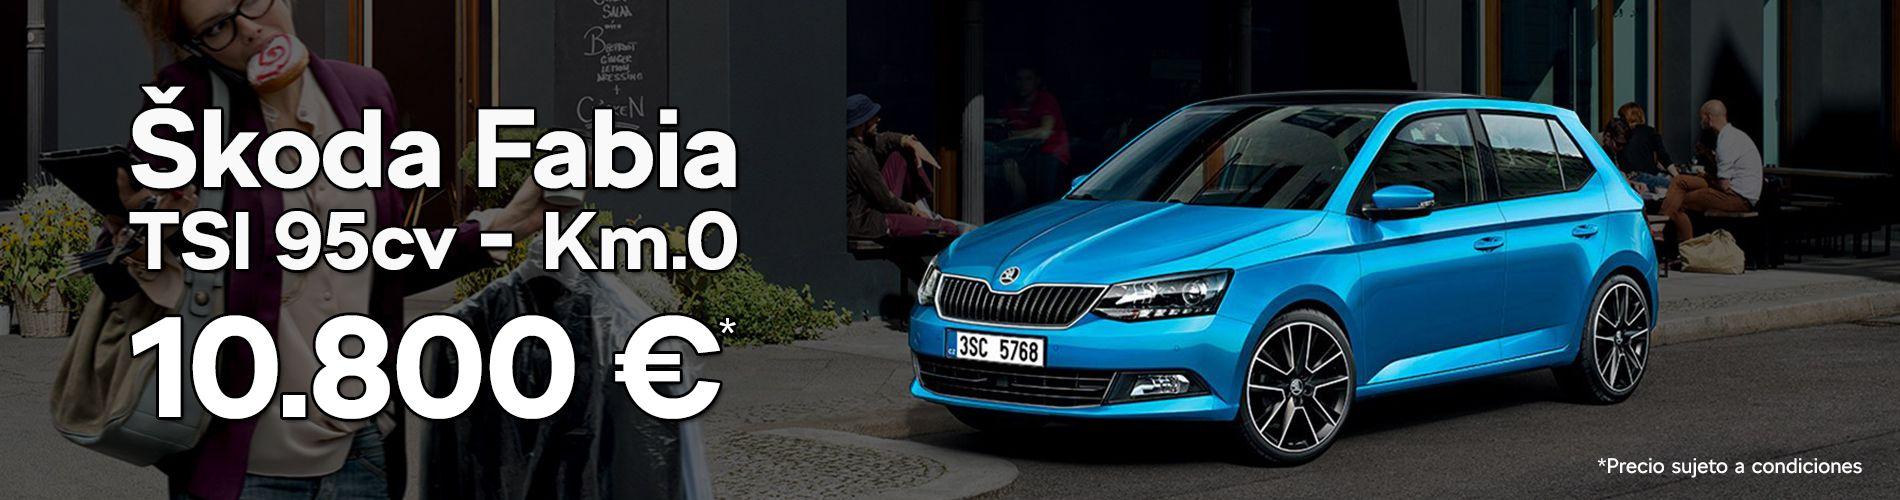 Skoda Fabia Ambition TSI Km.0 Azul